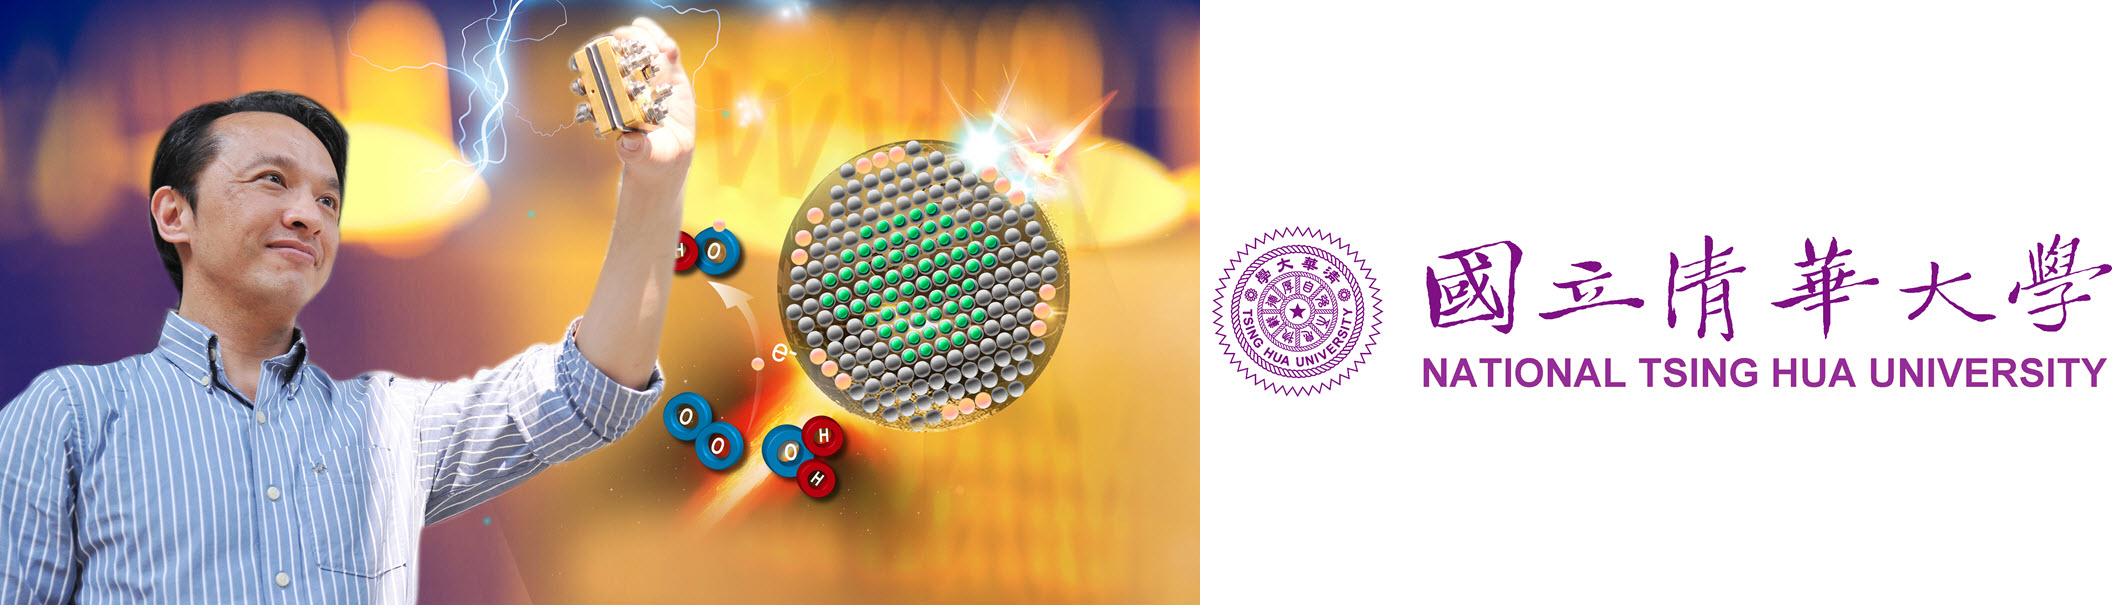 Chen Tsan Yao Breakthrough in Fuel Cells